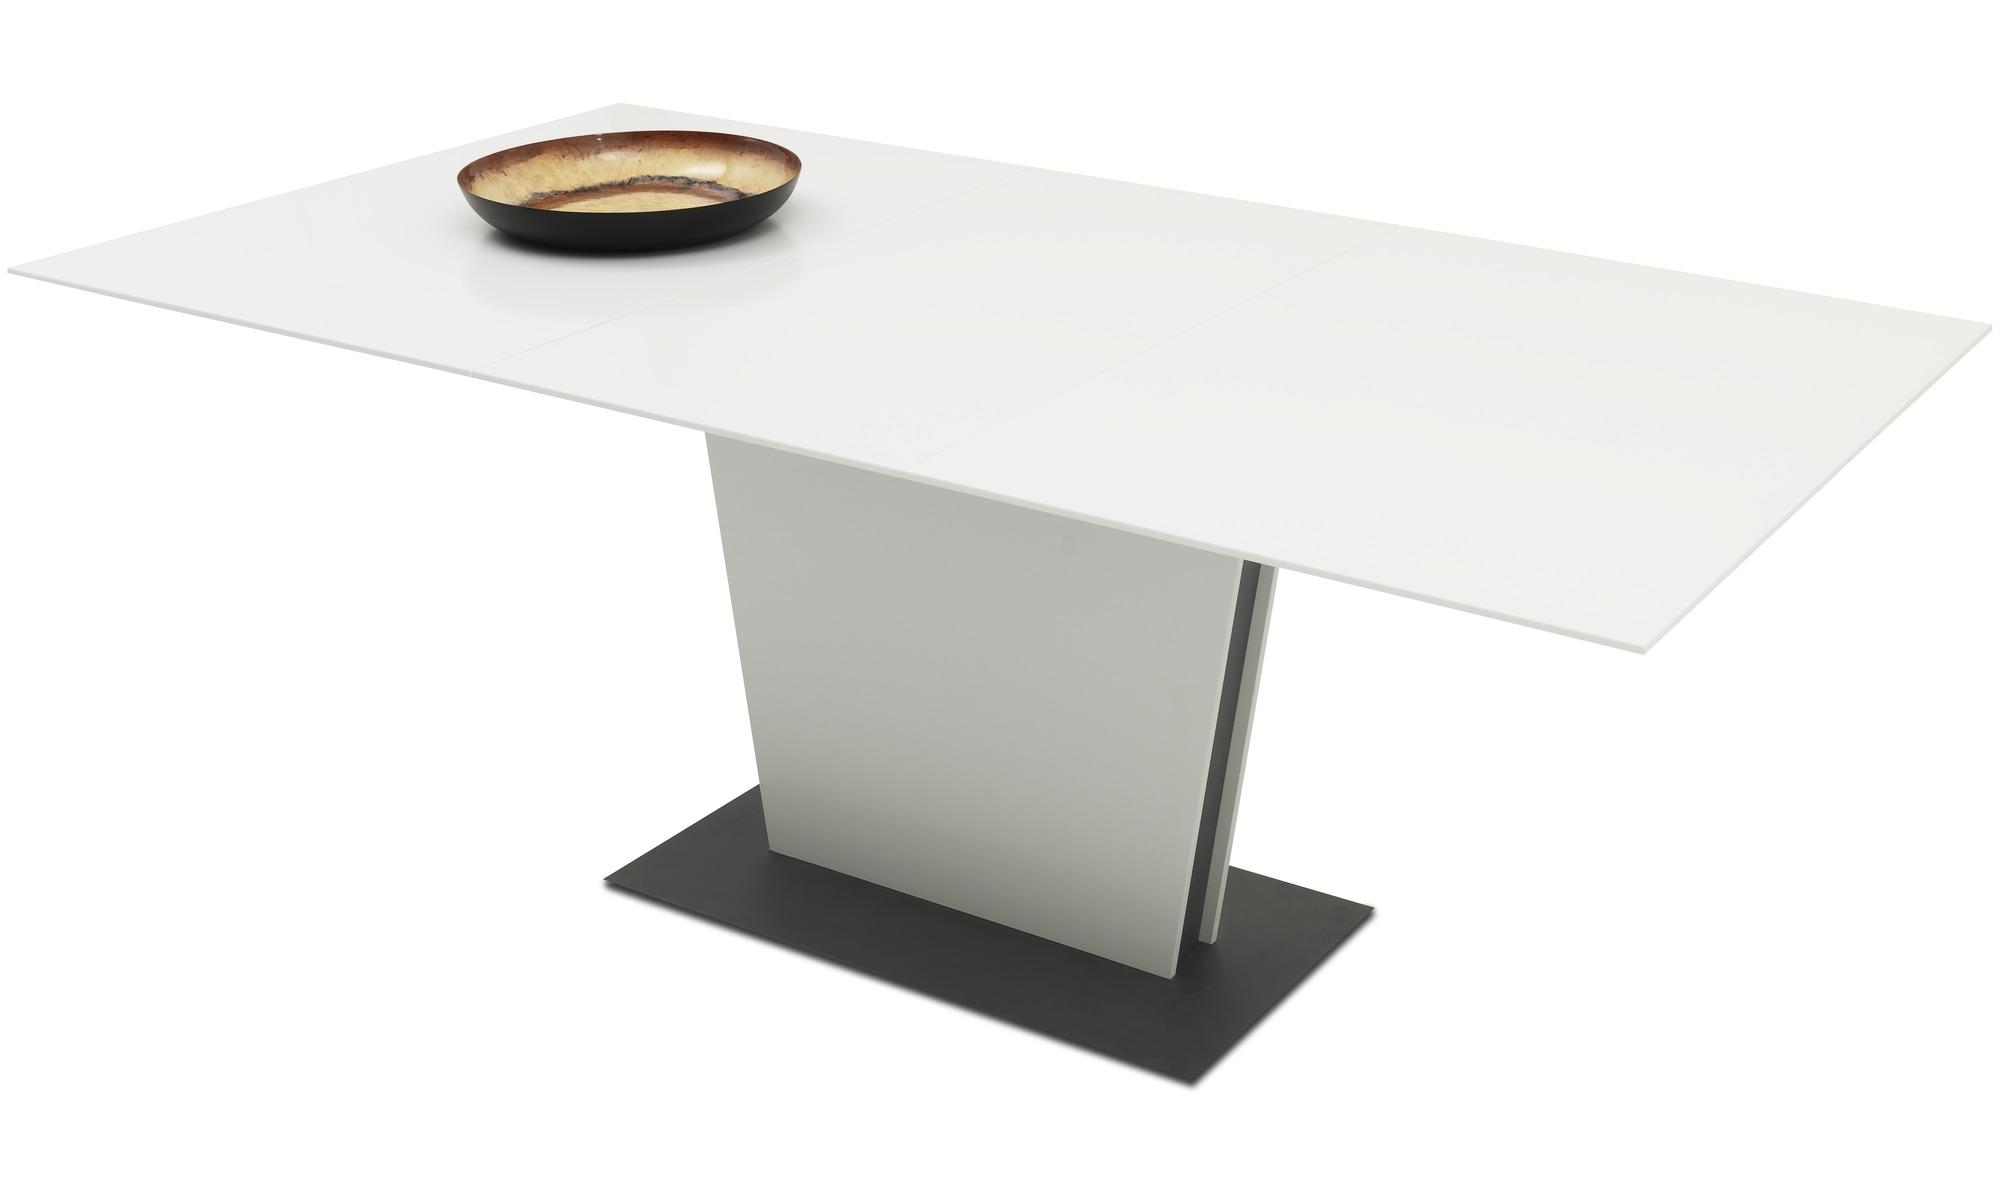 Eetkamertafel Vierkant Wit : Eetkamertafel milano tafel met extra tafelblad boconcept